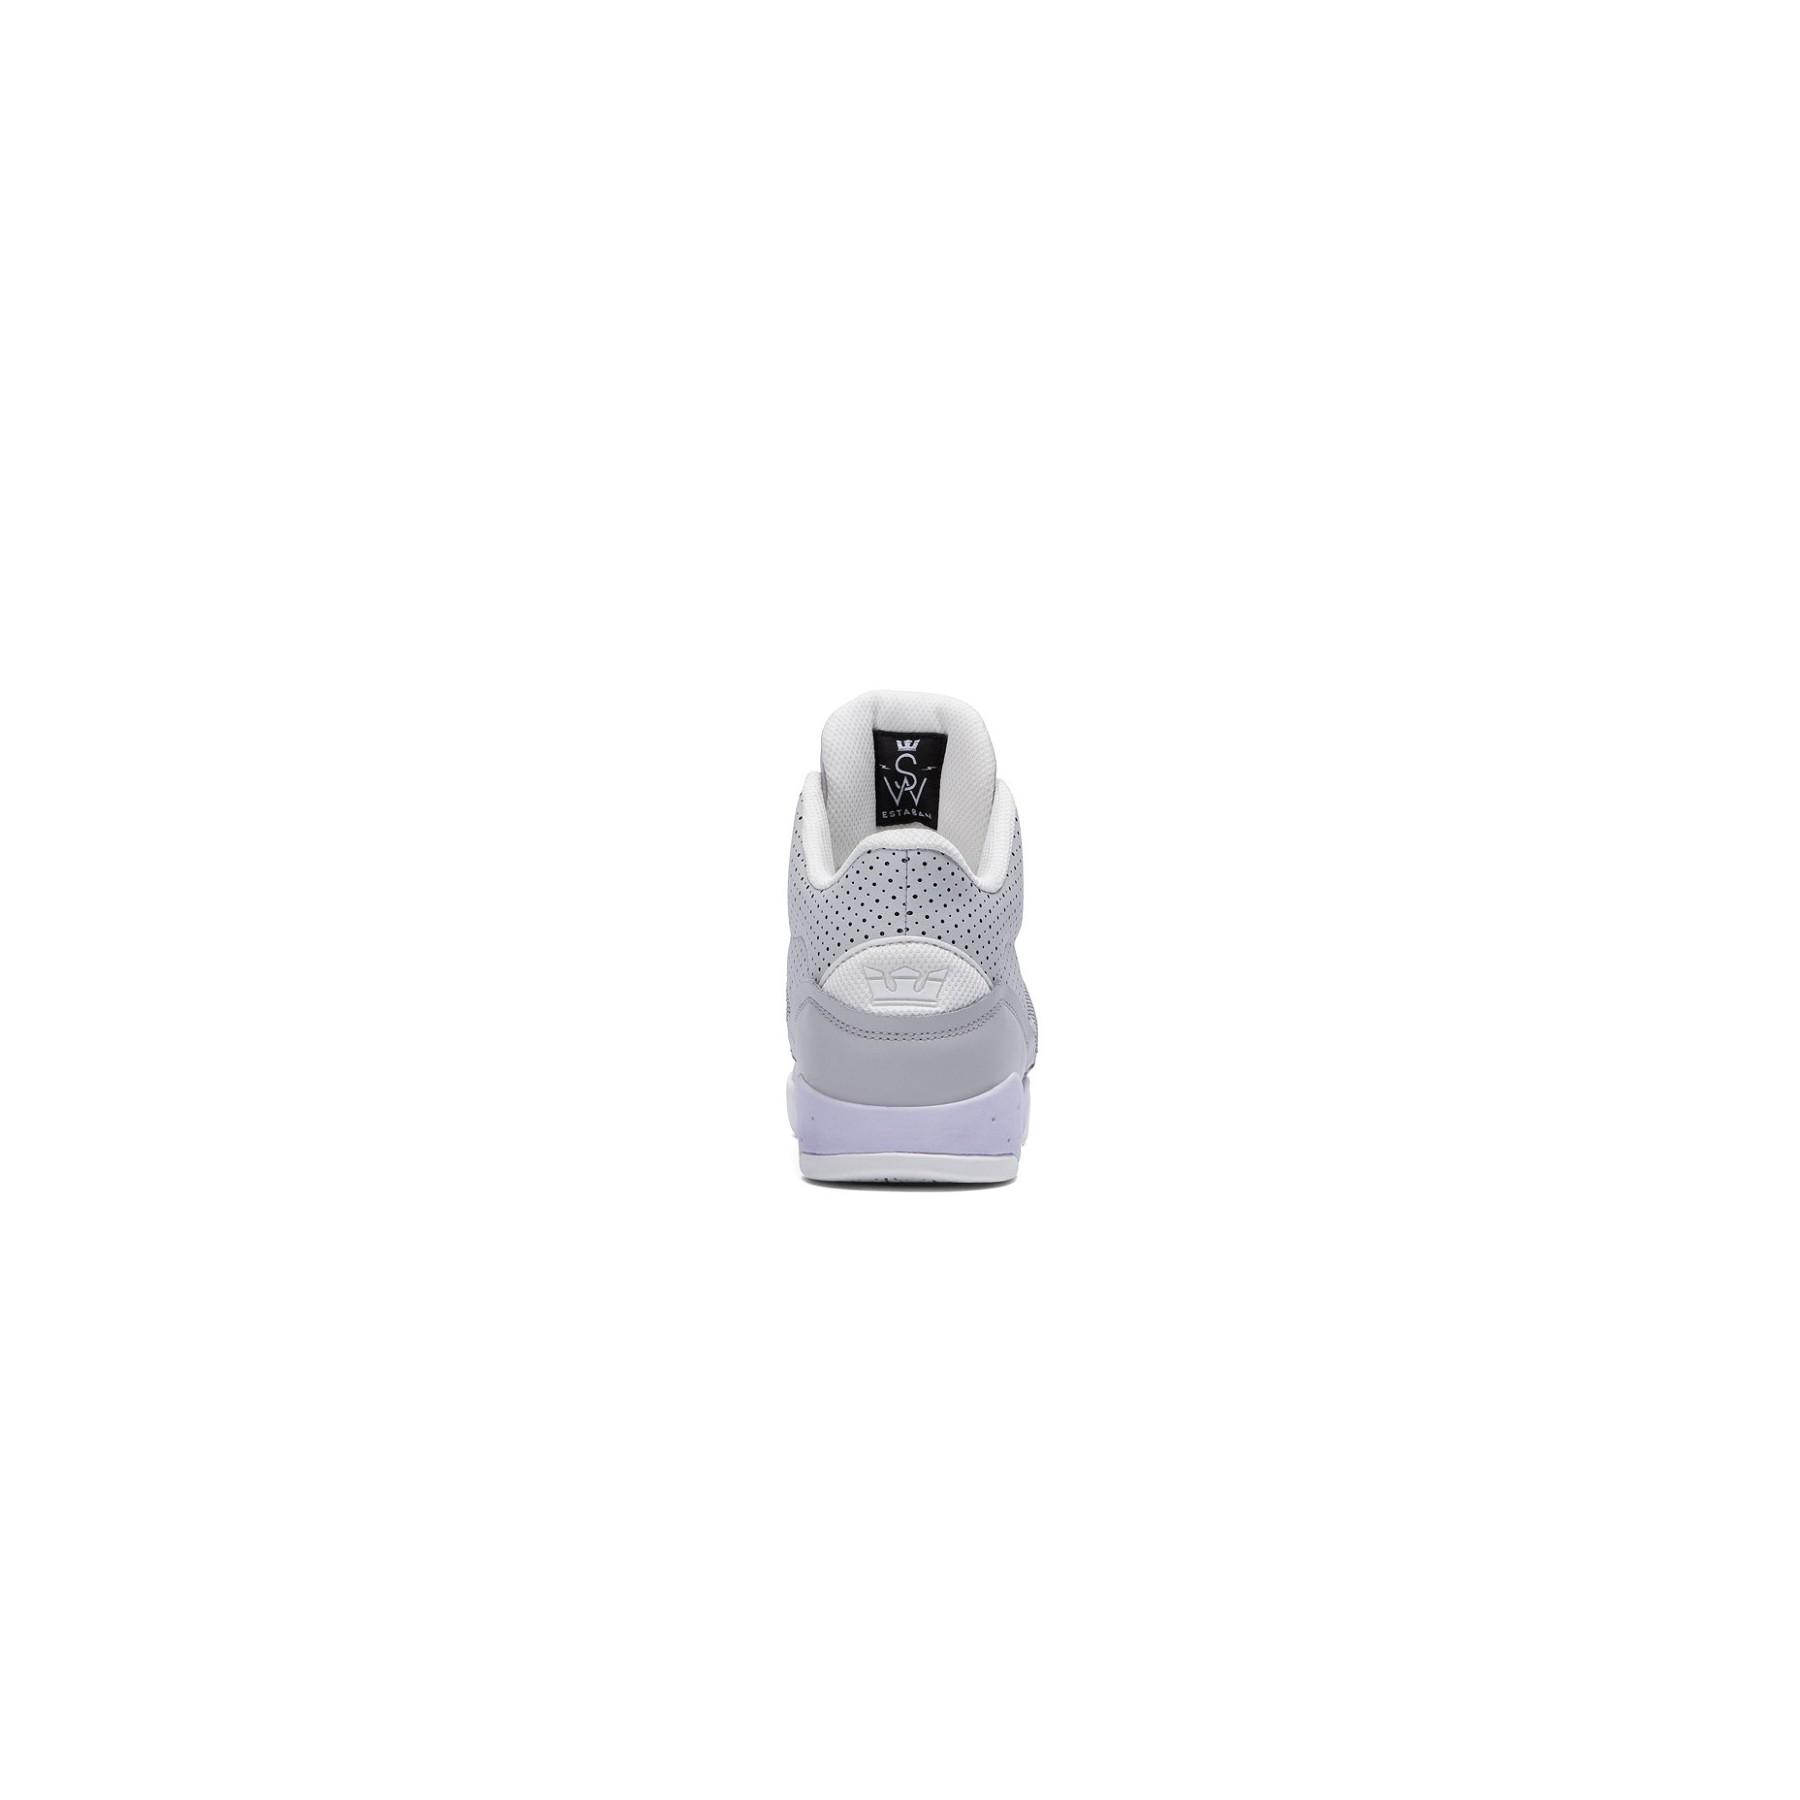 Scarpa Alta Supra Shoes Estaban Lightgrey Offwhite Unico